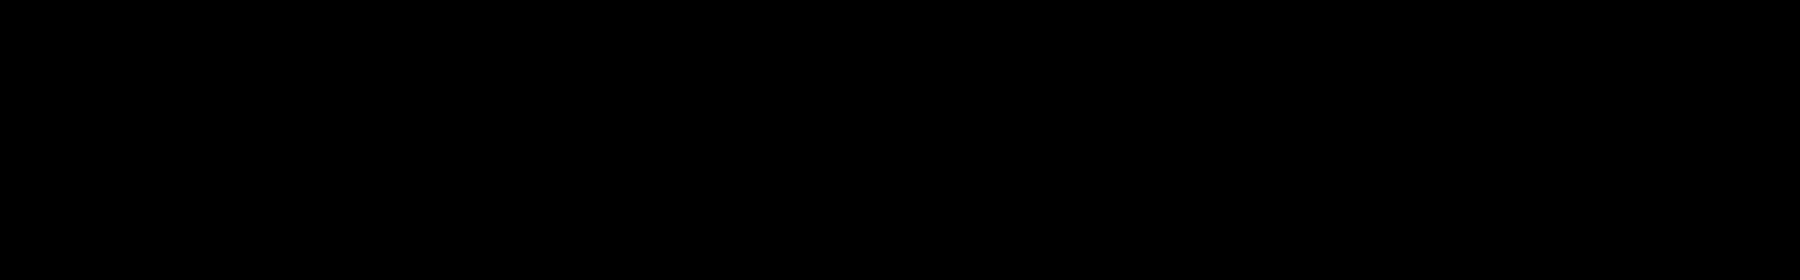 Suspense - Dark Cinematic Loops audio waveform